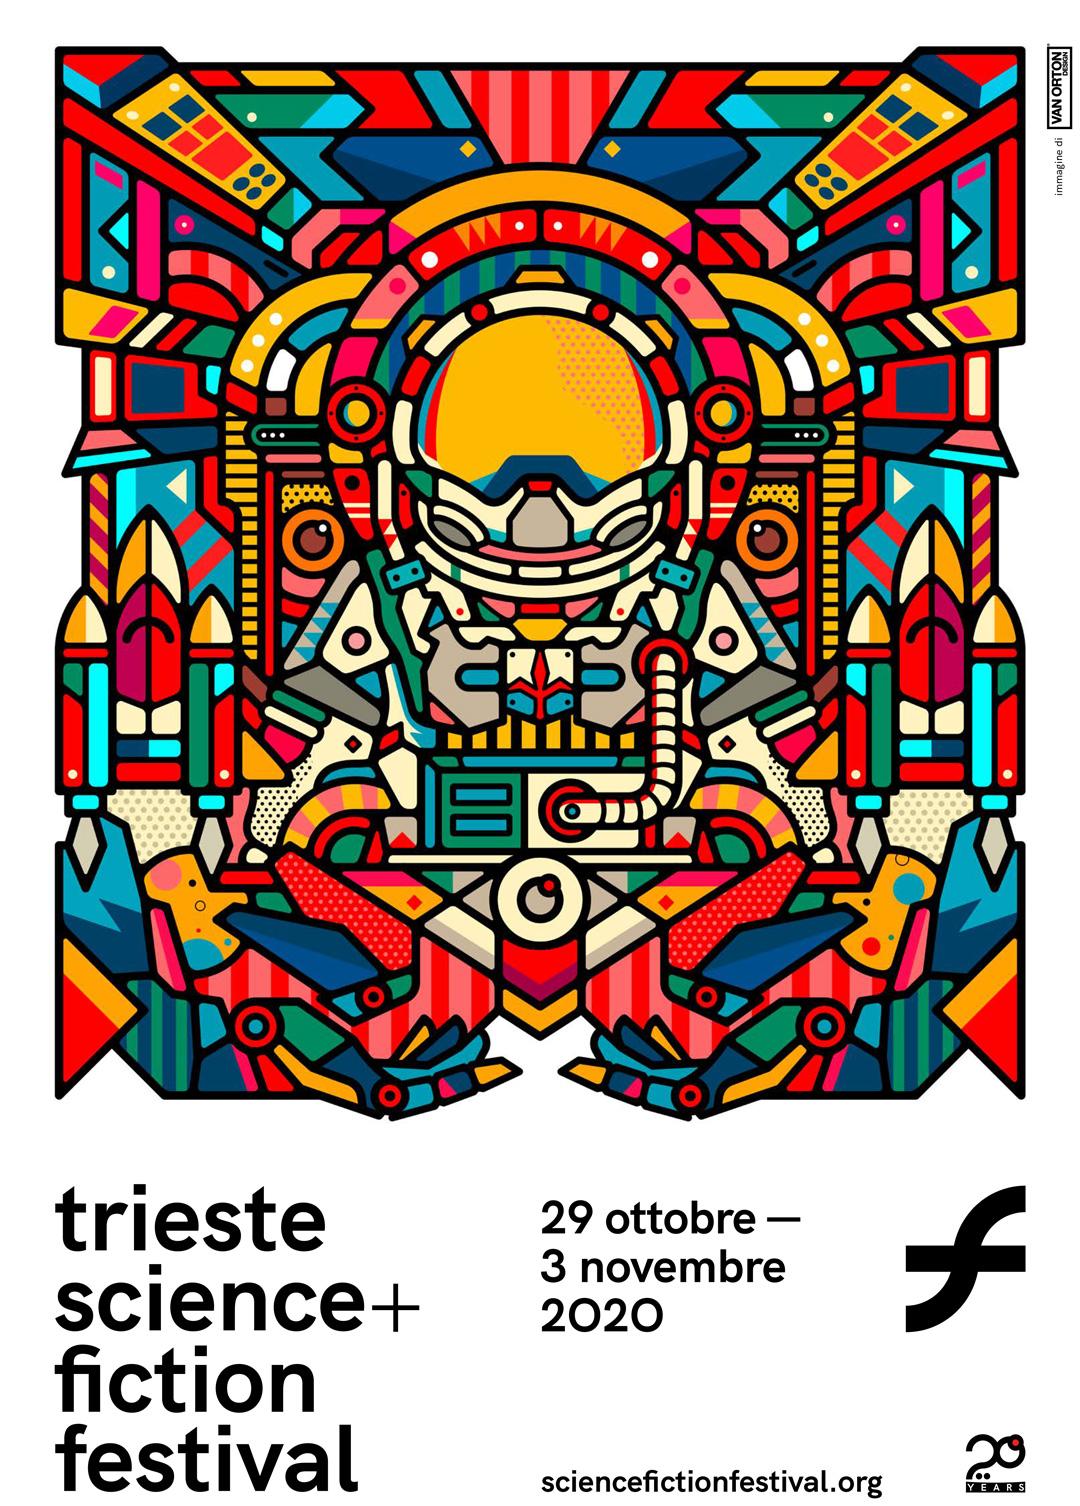 TS+FF20-Trieste-Science+Fiction-Poster-2020-by-Van-Orton-WEB